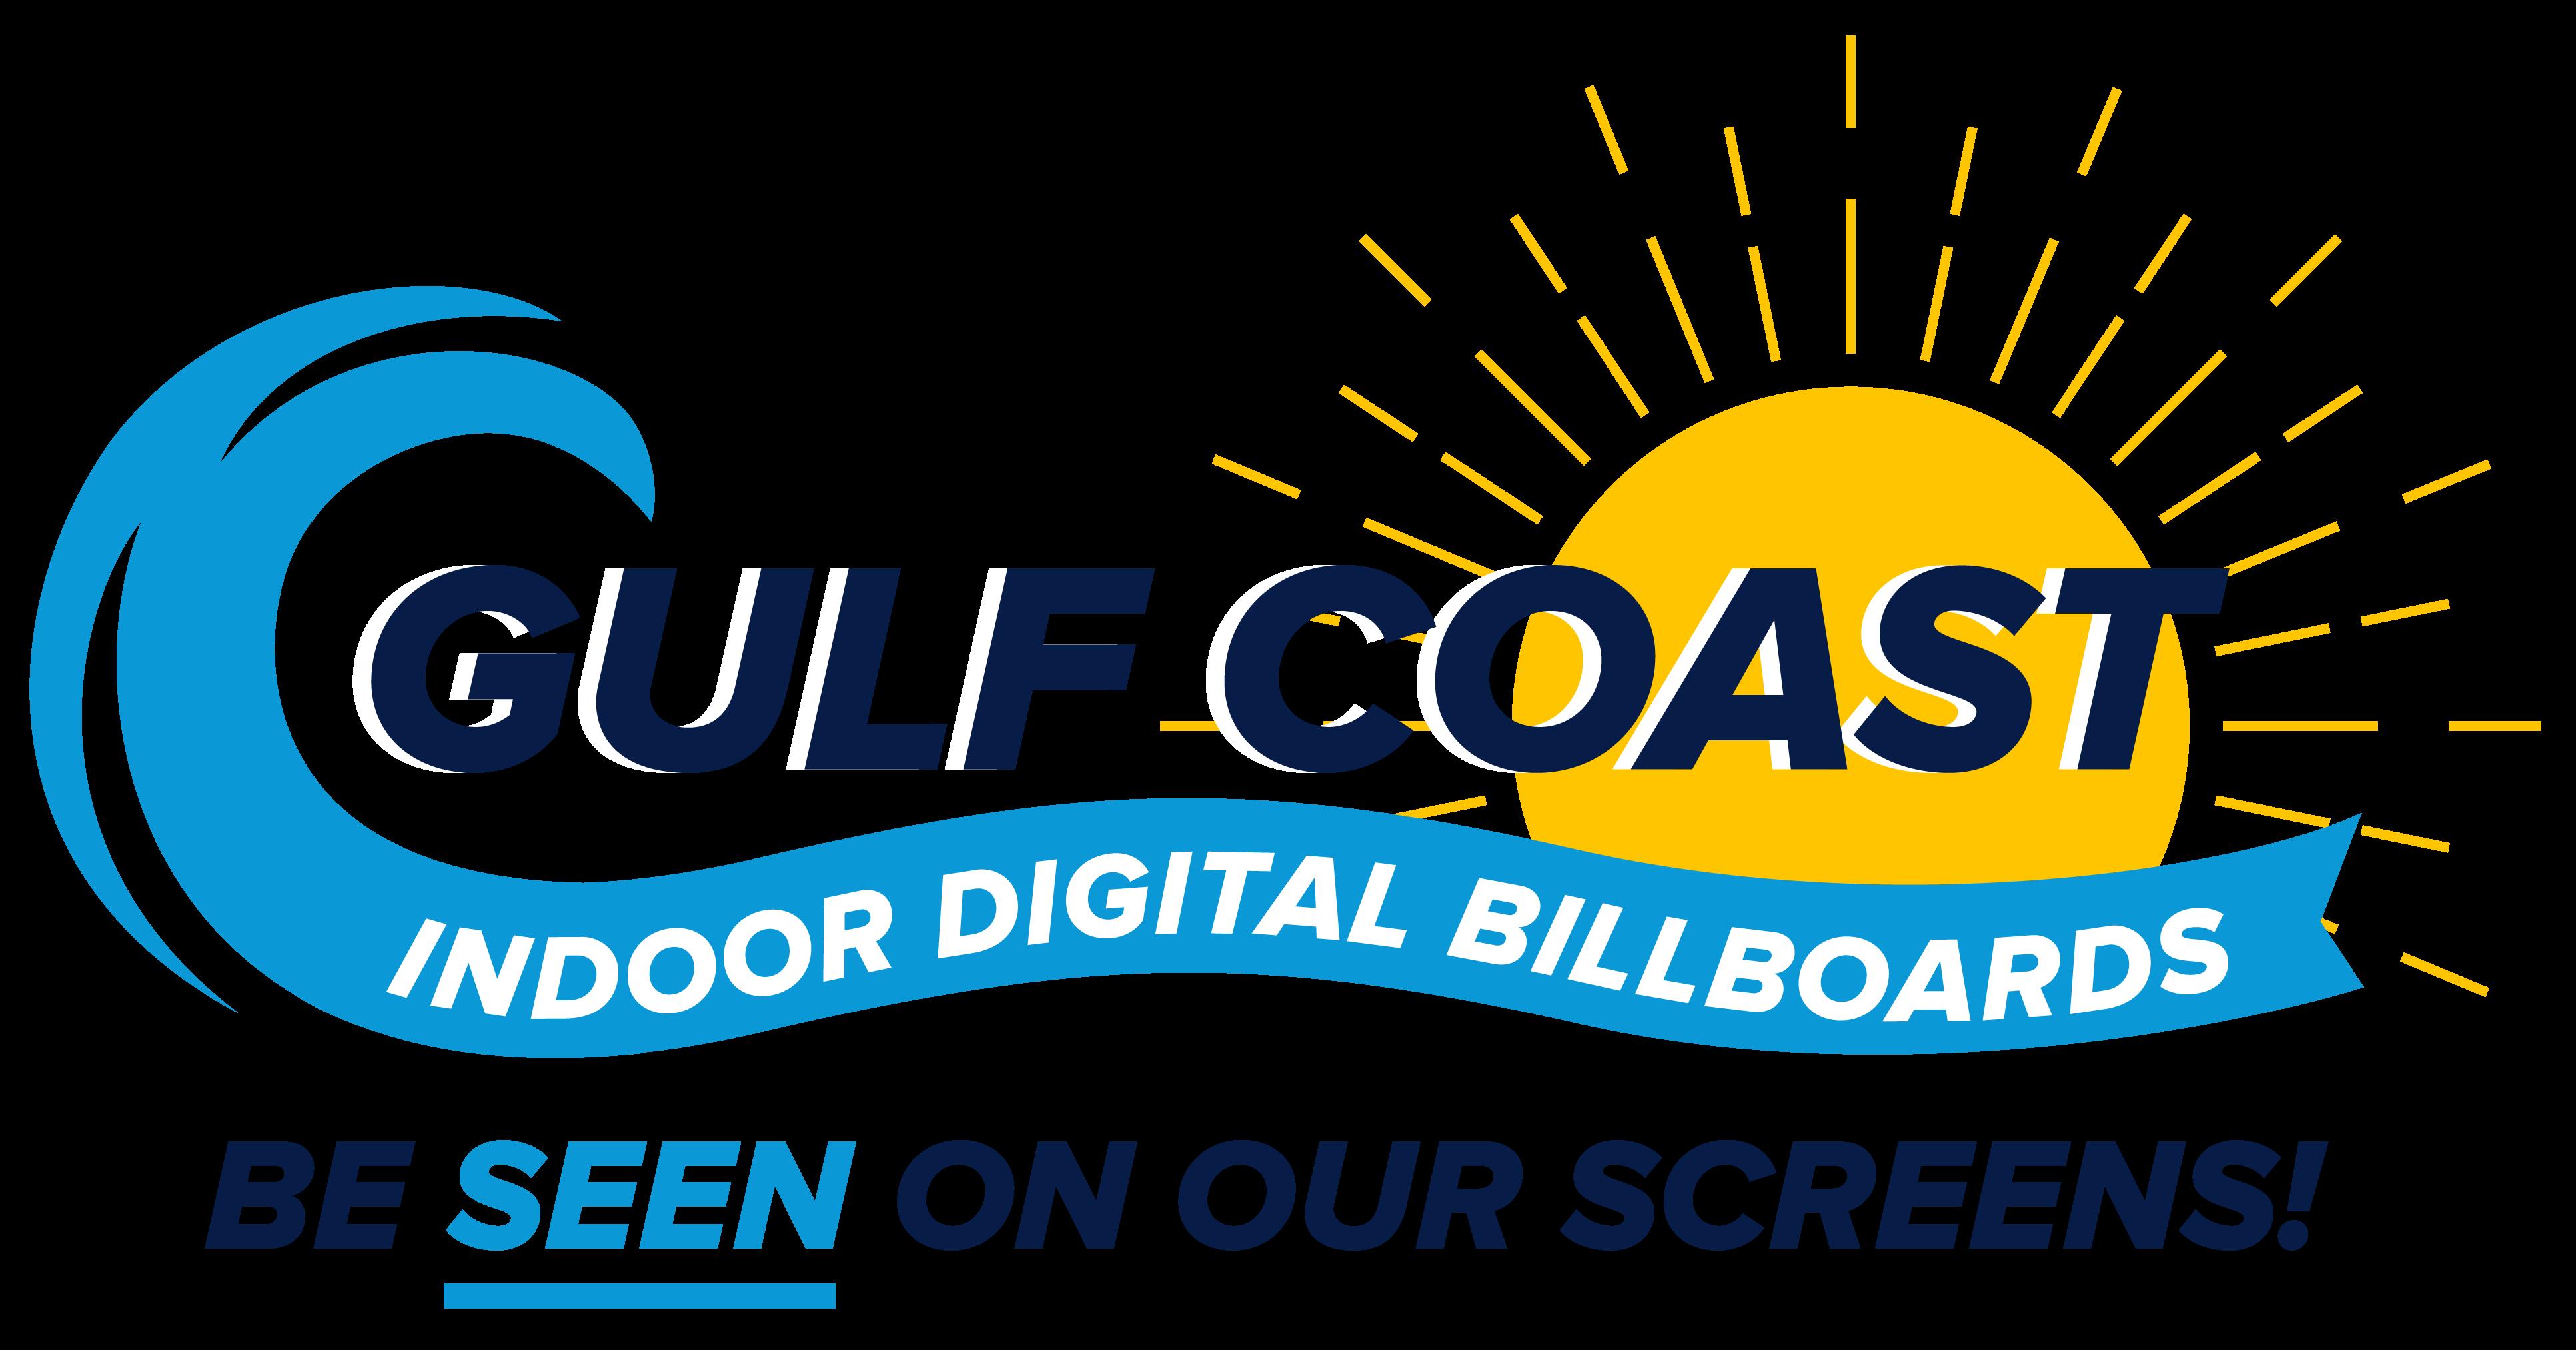 Gulf Coast Indoor Digital Billboards